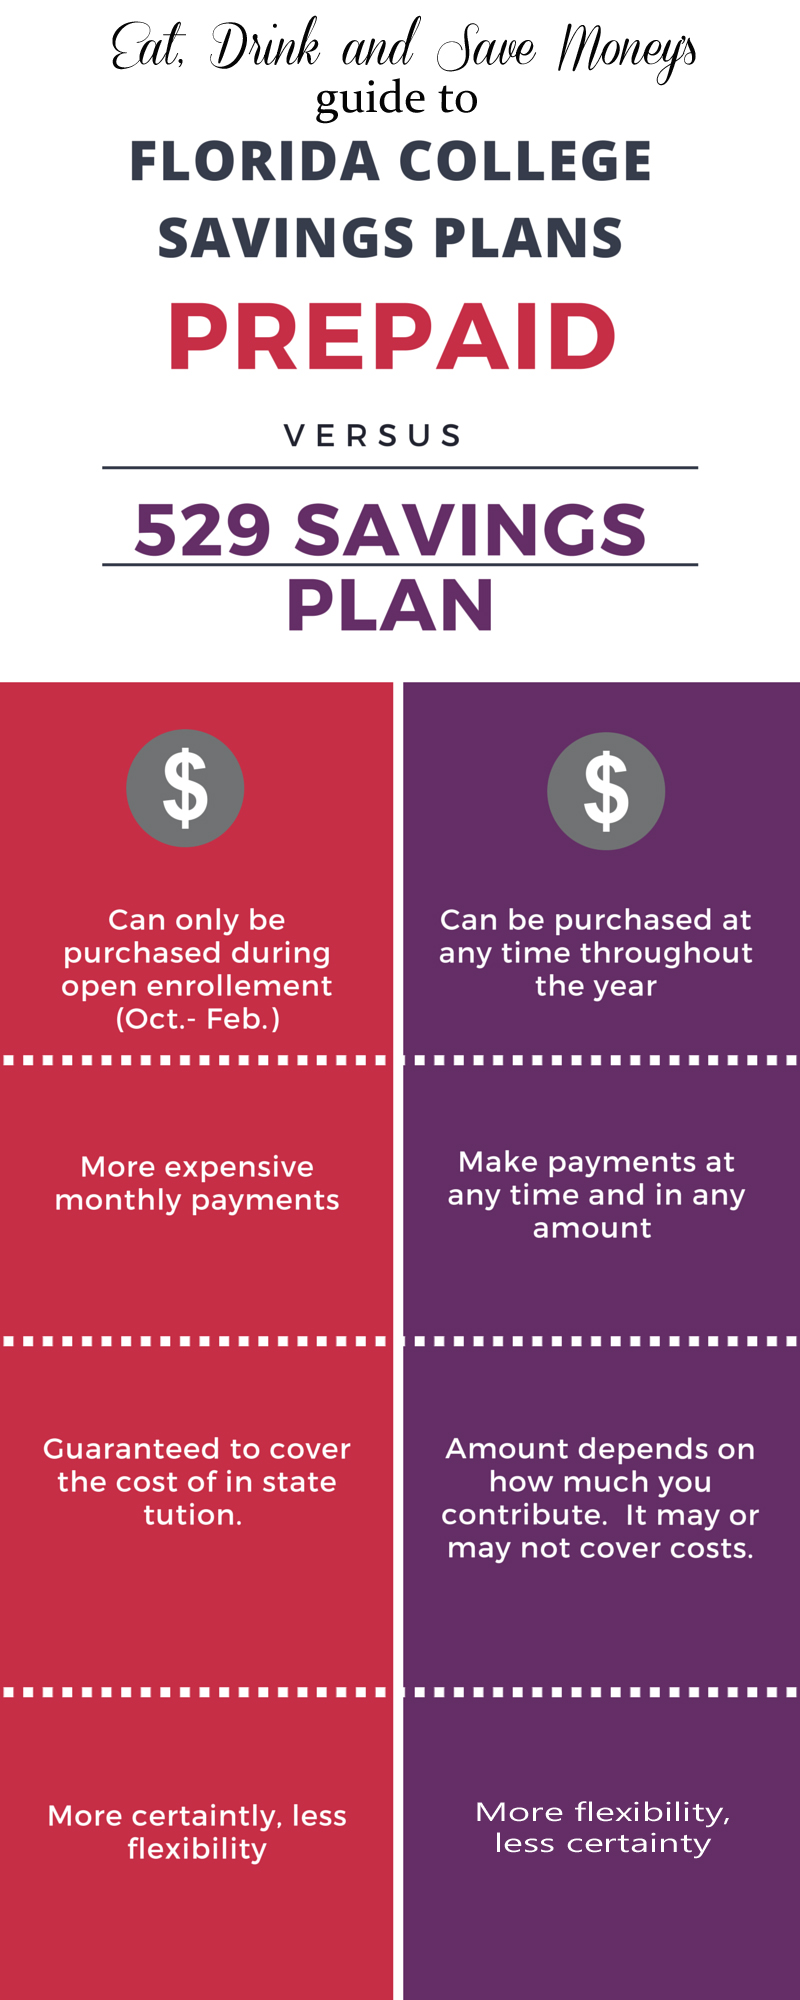 Florida prepaid college savings plan infographic